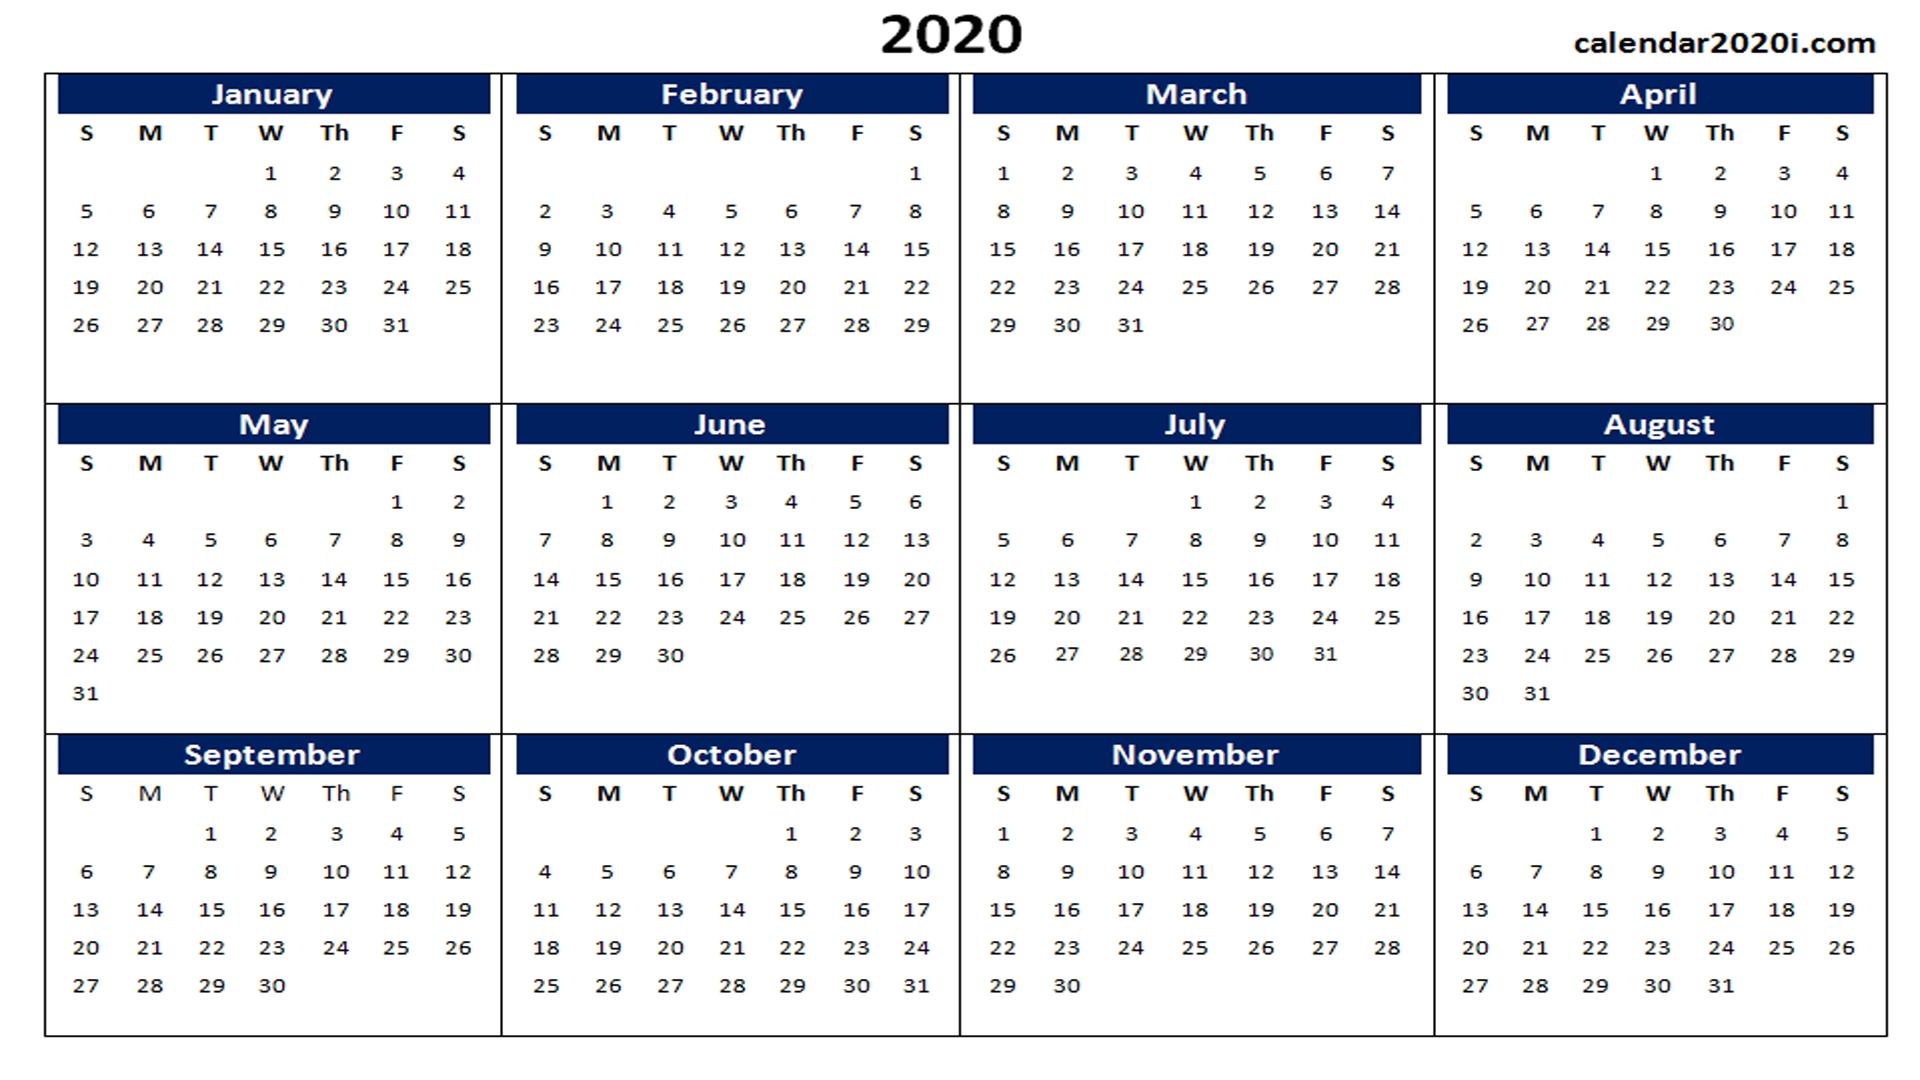 Blank 2020 Calendar Printable Templates | Calendar 2020-Blank 2020 Calendar Template